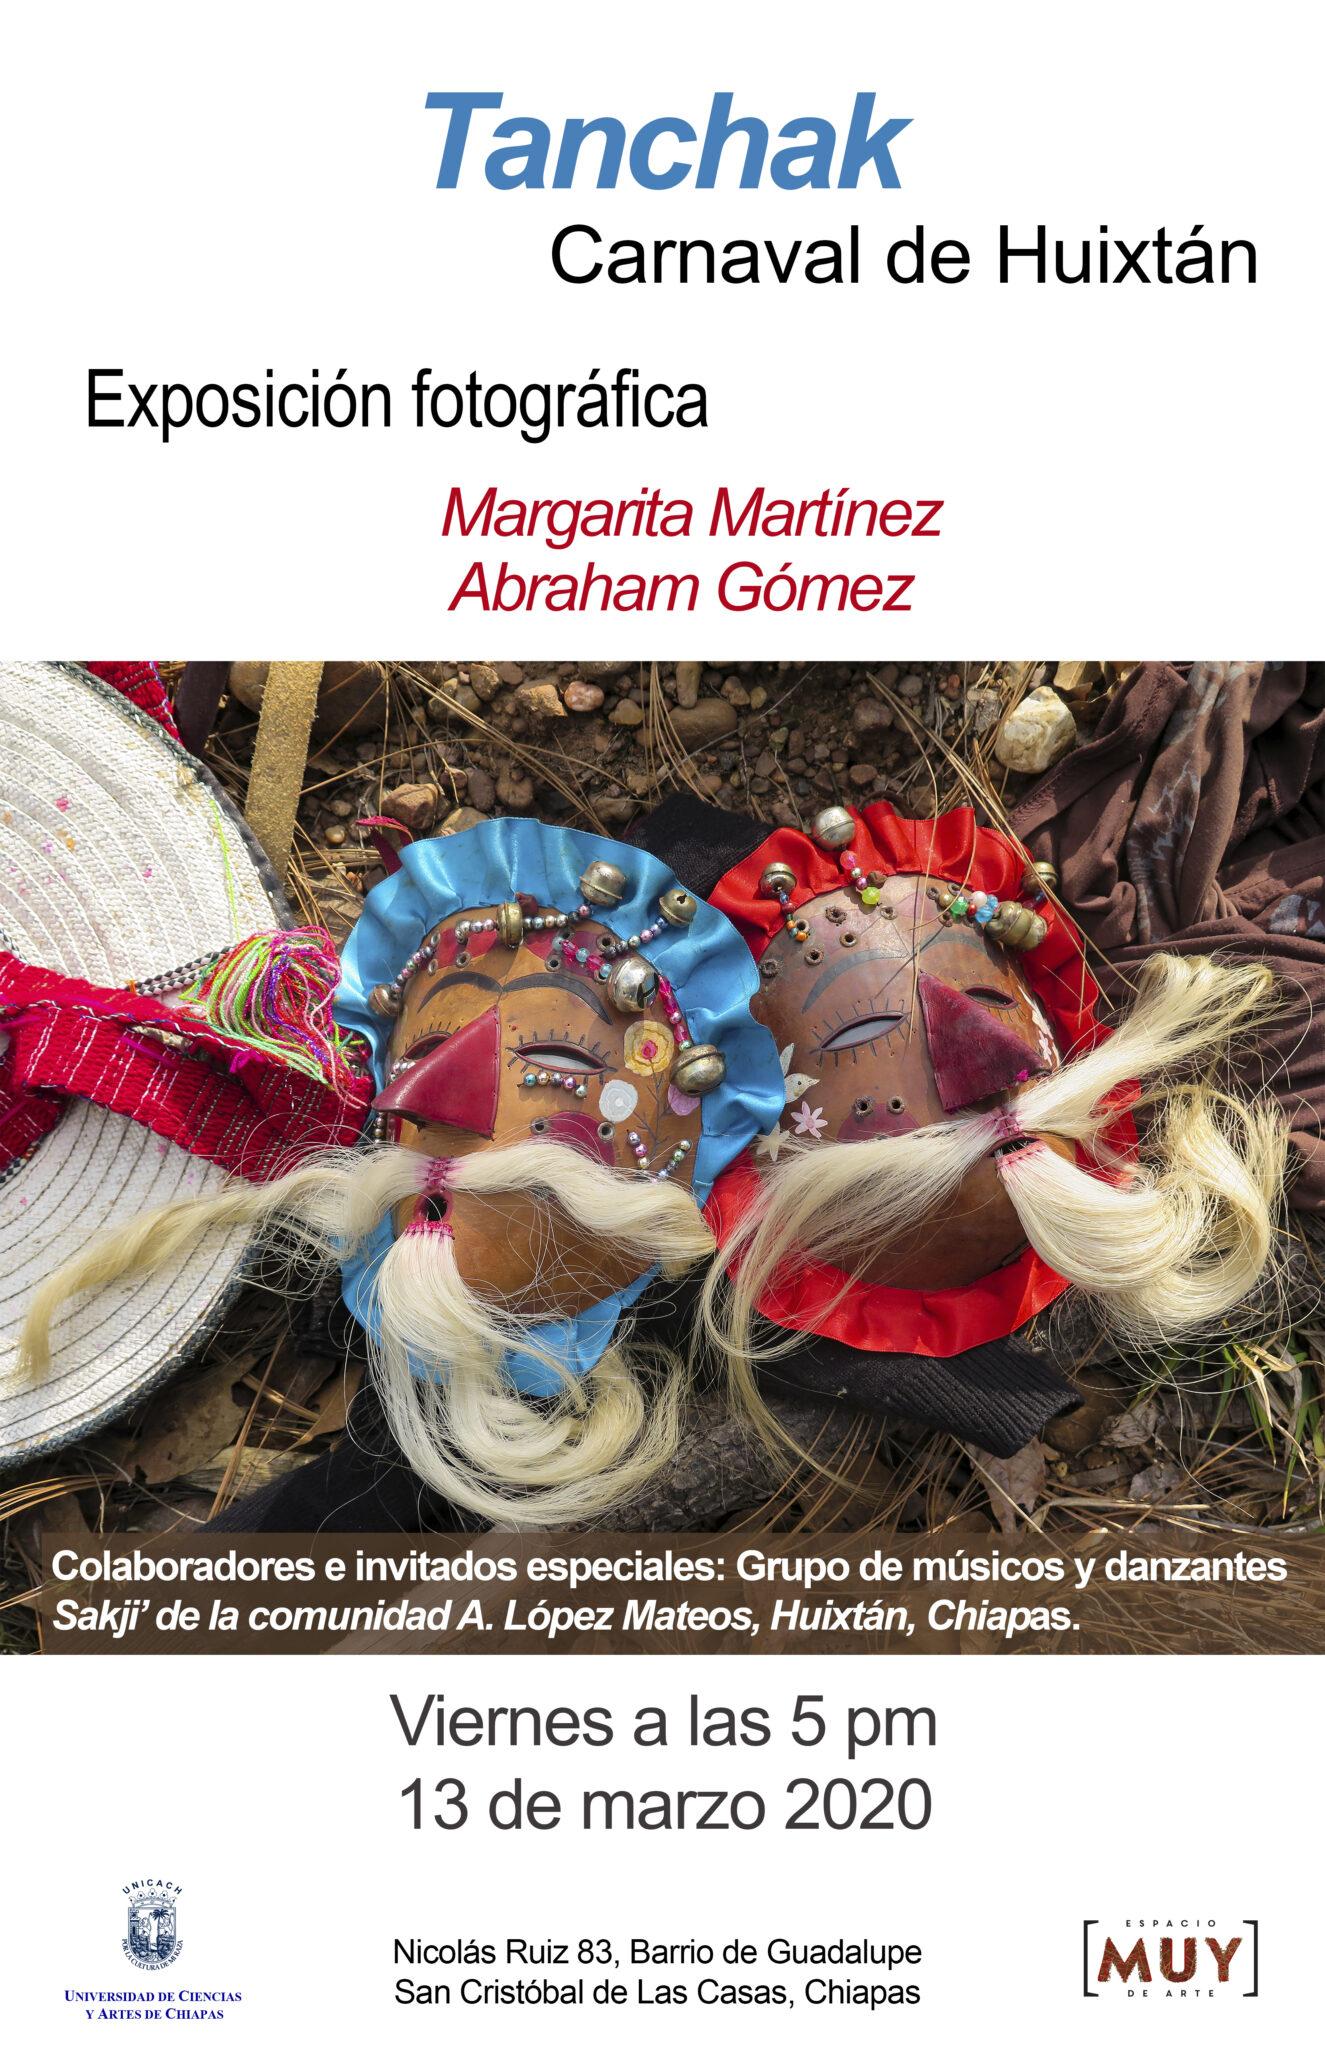 Carnaval de Huixtán